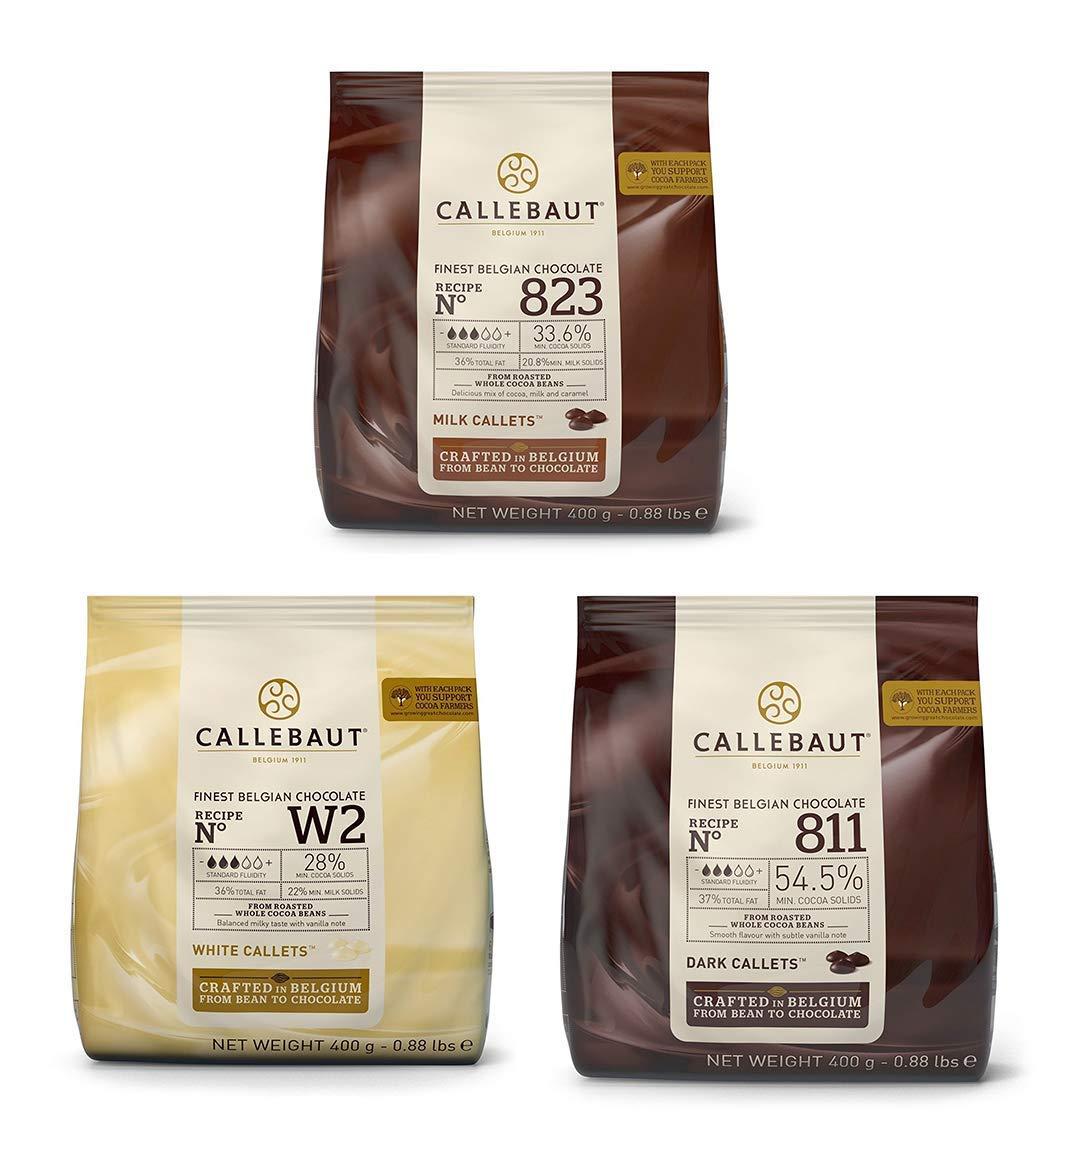 Callebaut Chocolate Bundle 3x400g Milk, Dark and White couverture callets